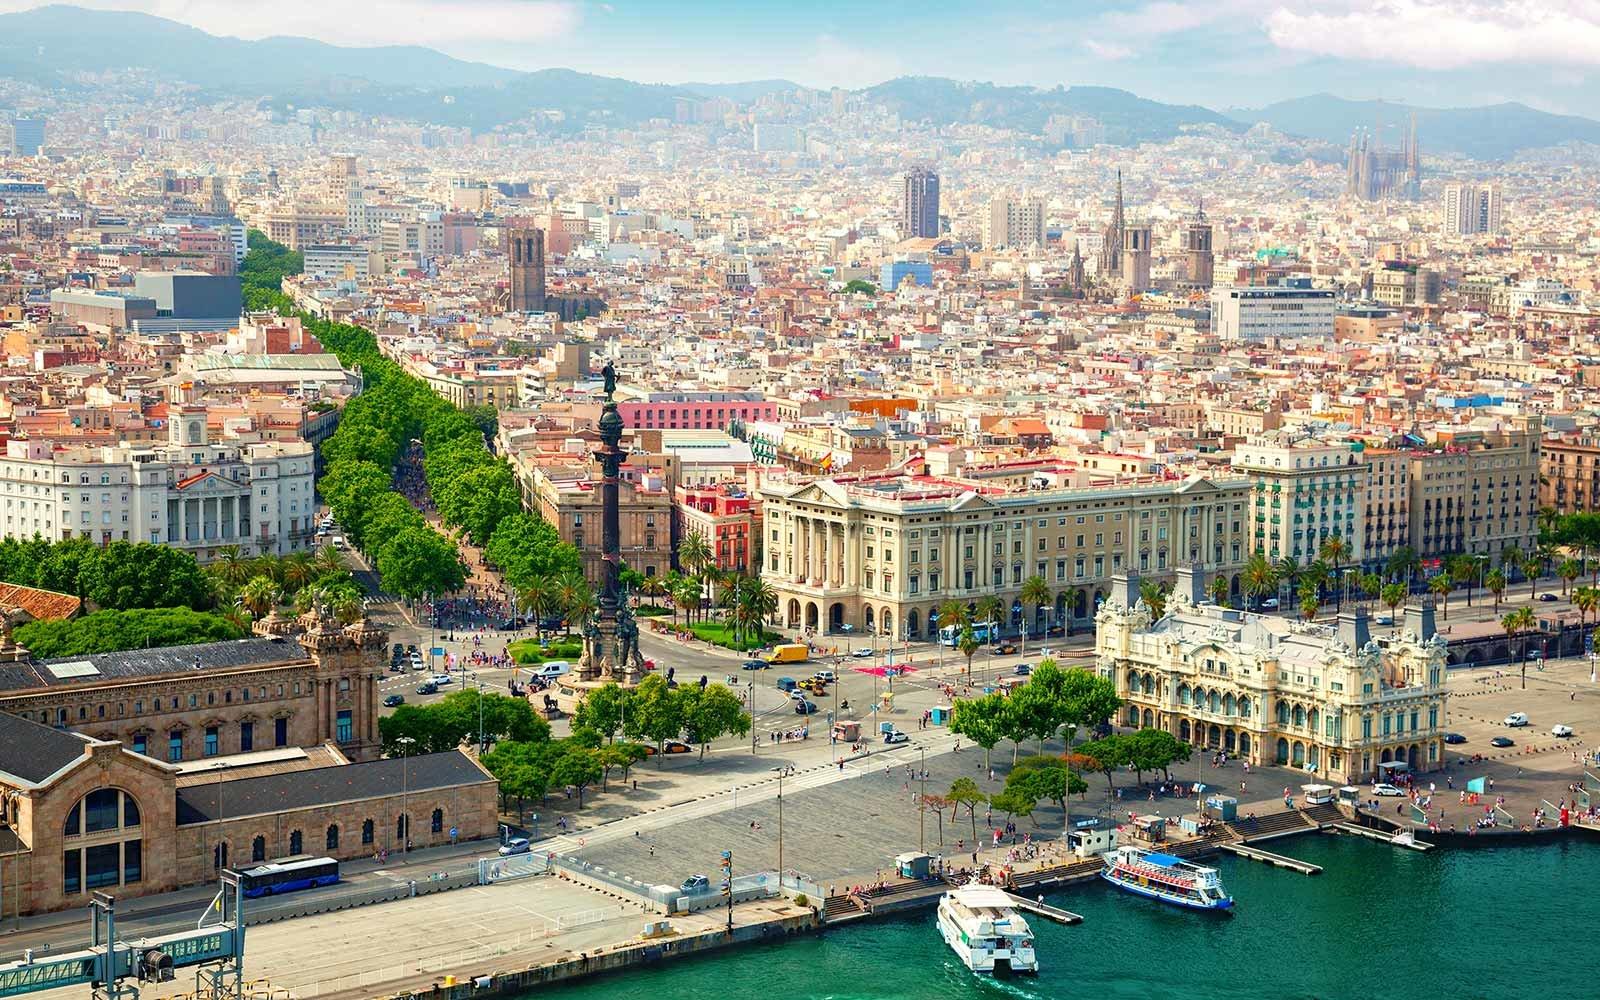 Barcelona, capitala Cataloniei